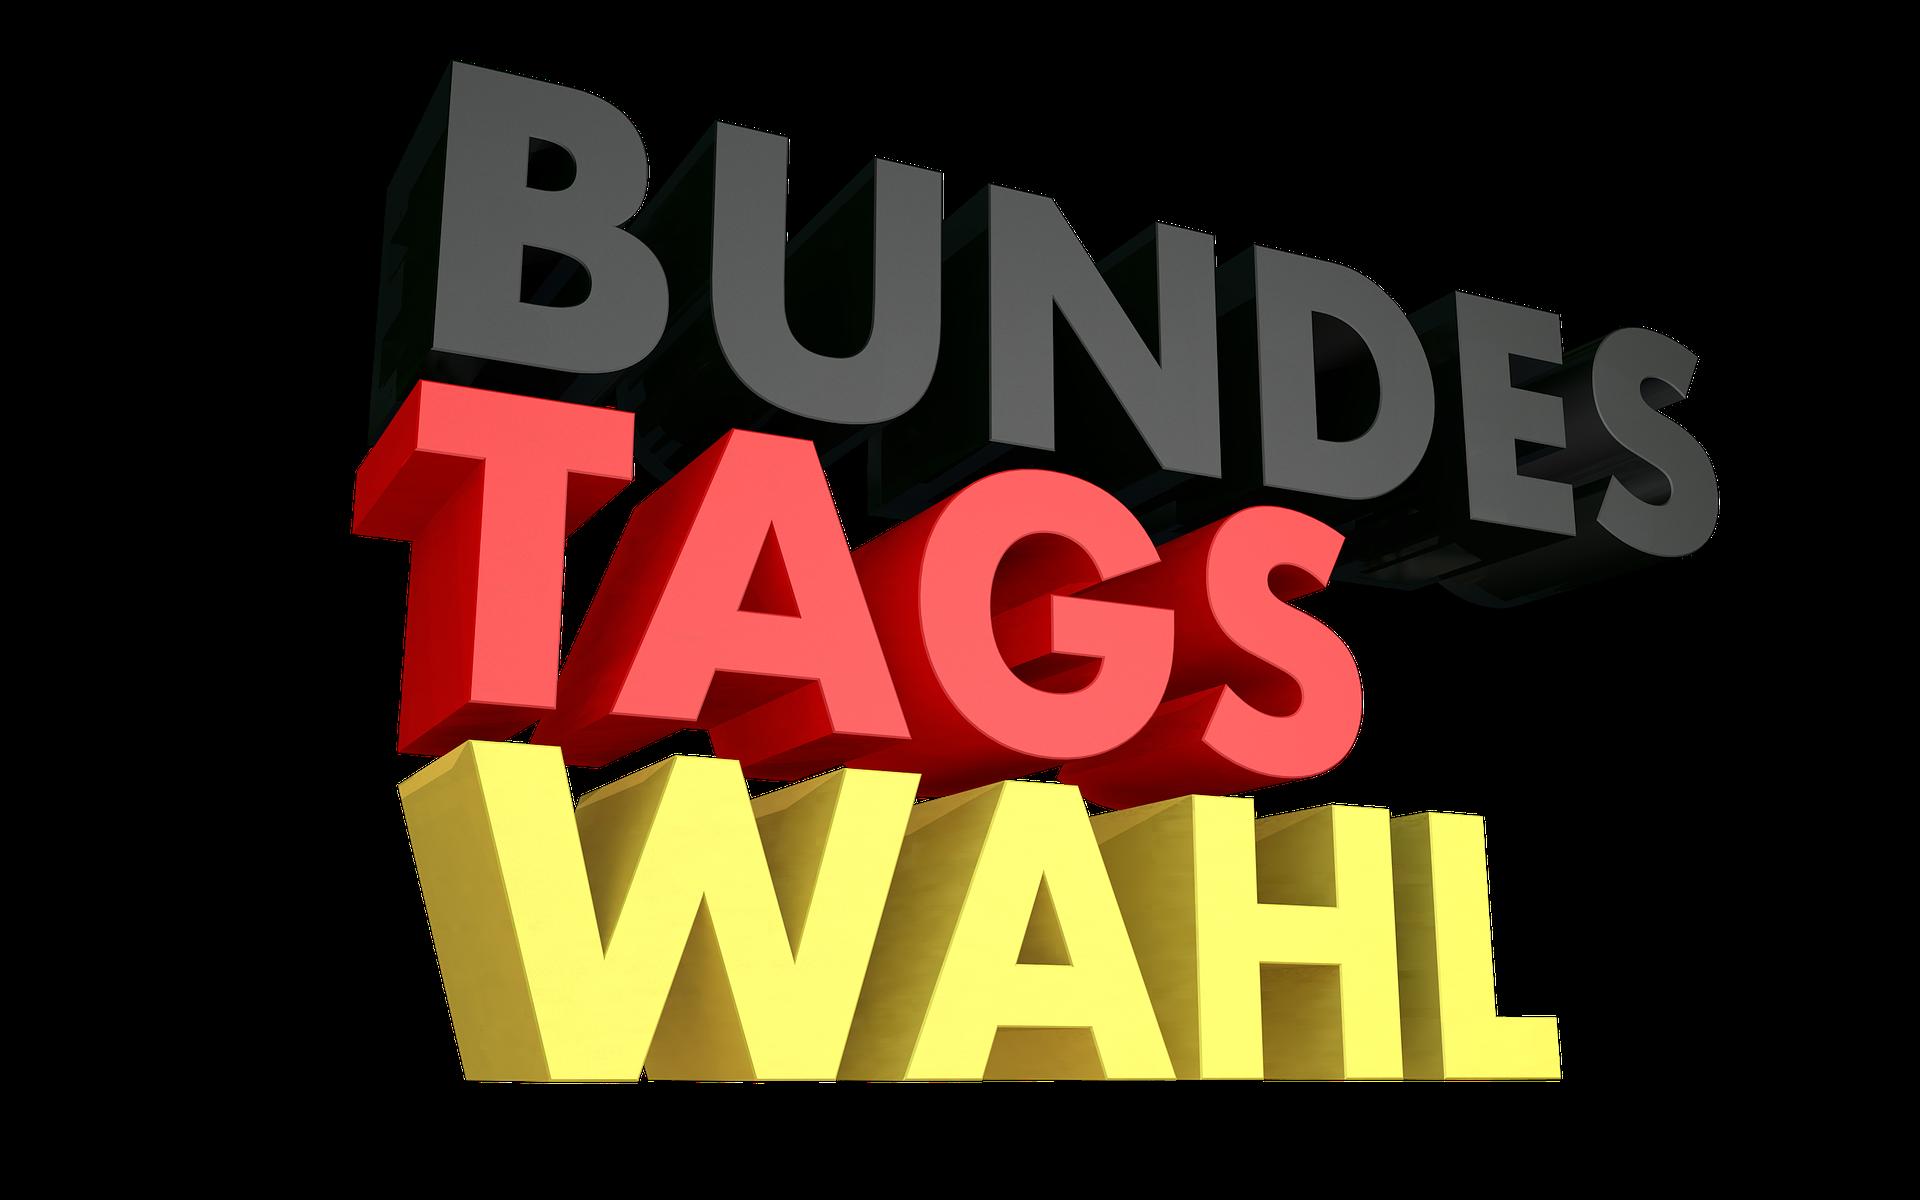 Schriftzug Bundestagswahl